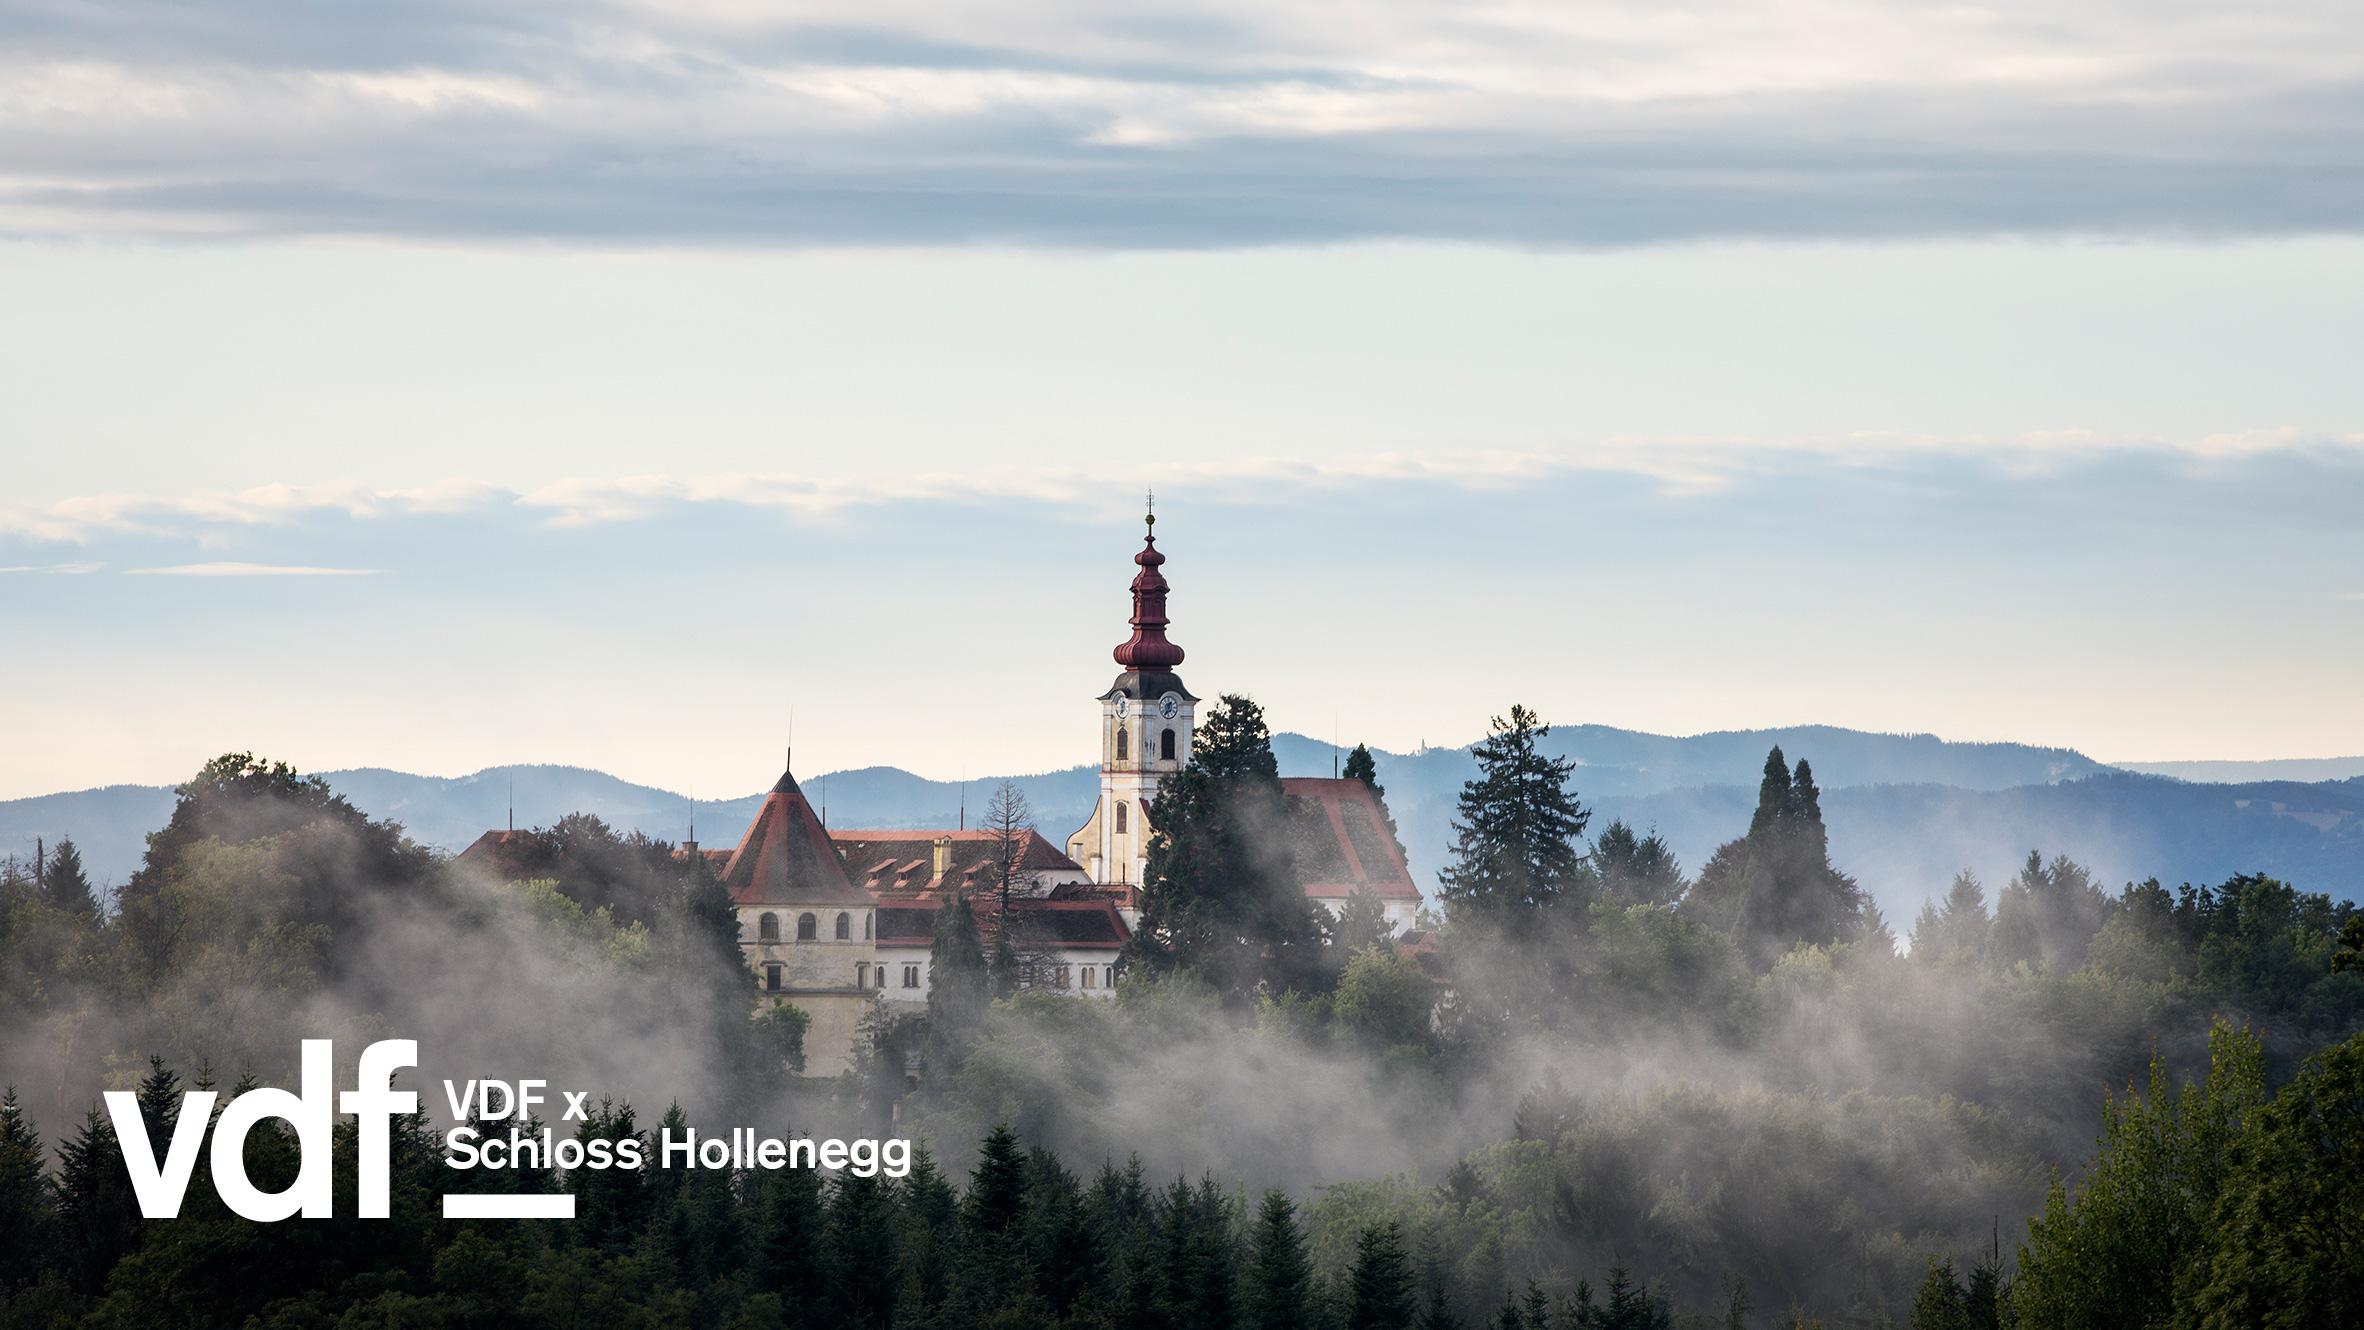 Live Tour Of Design Exhibition At Historic Austrian Castle With